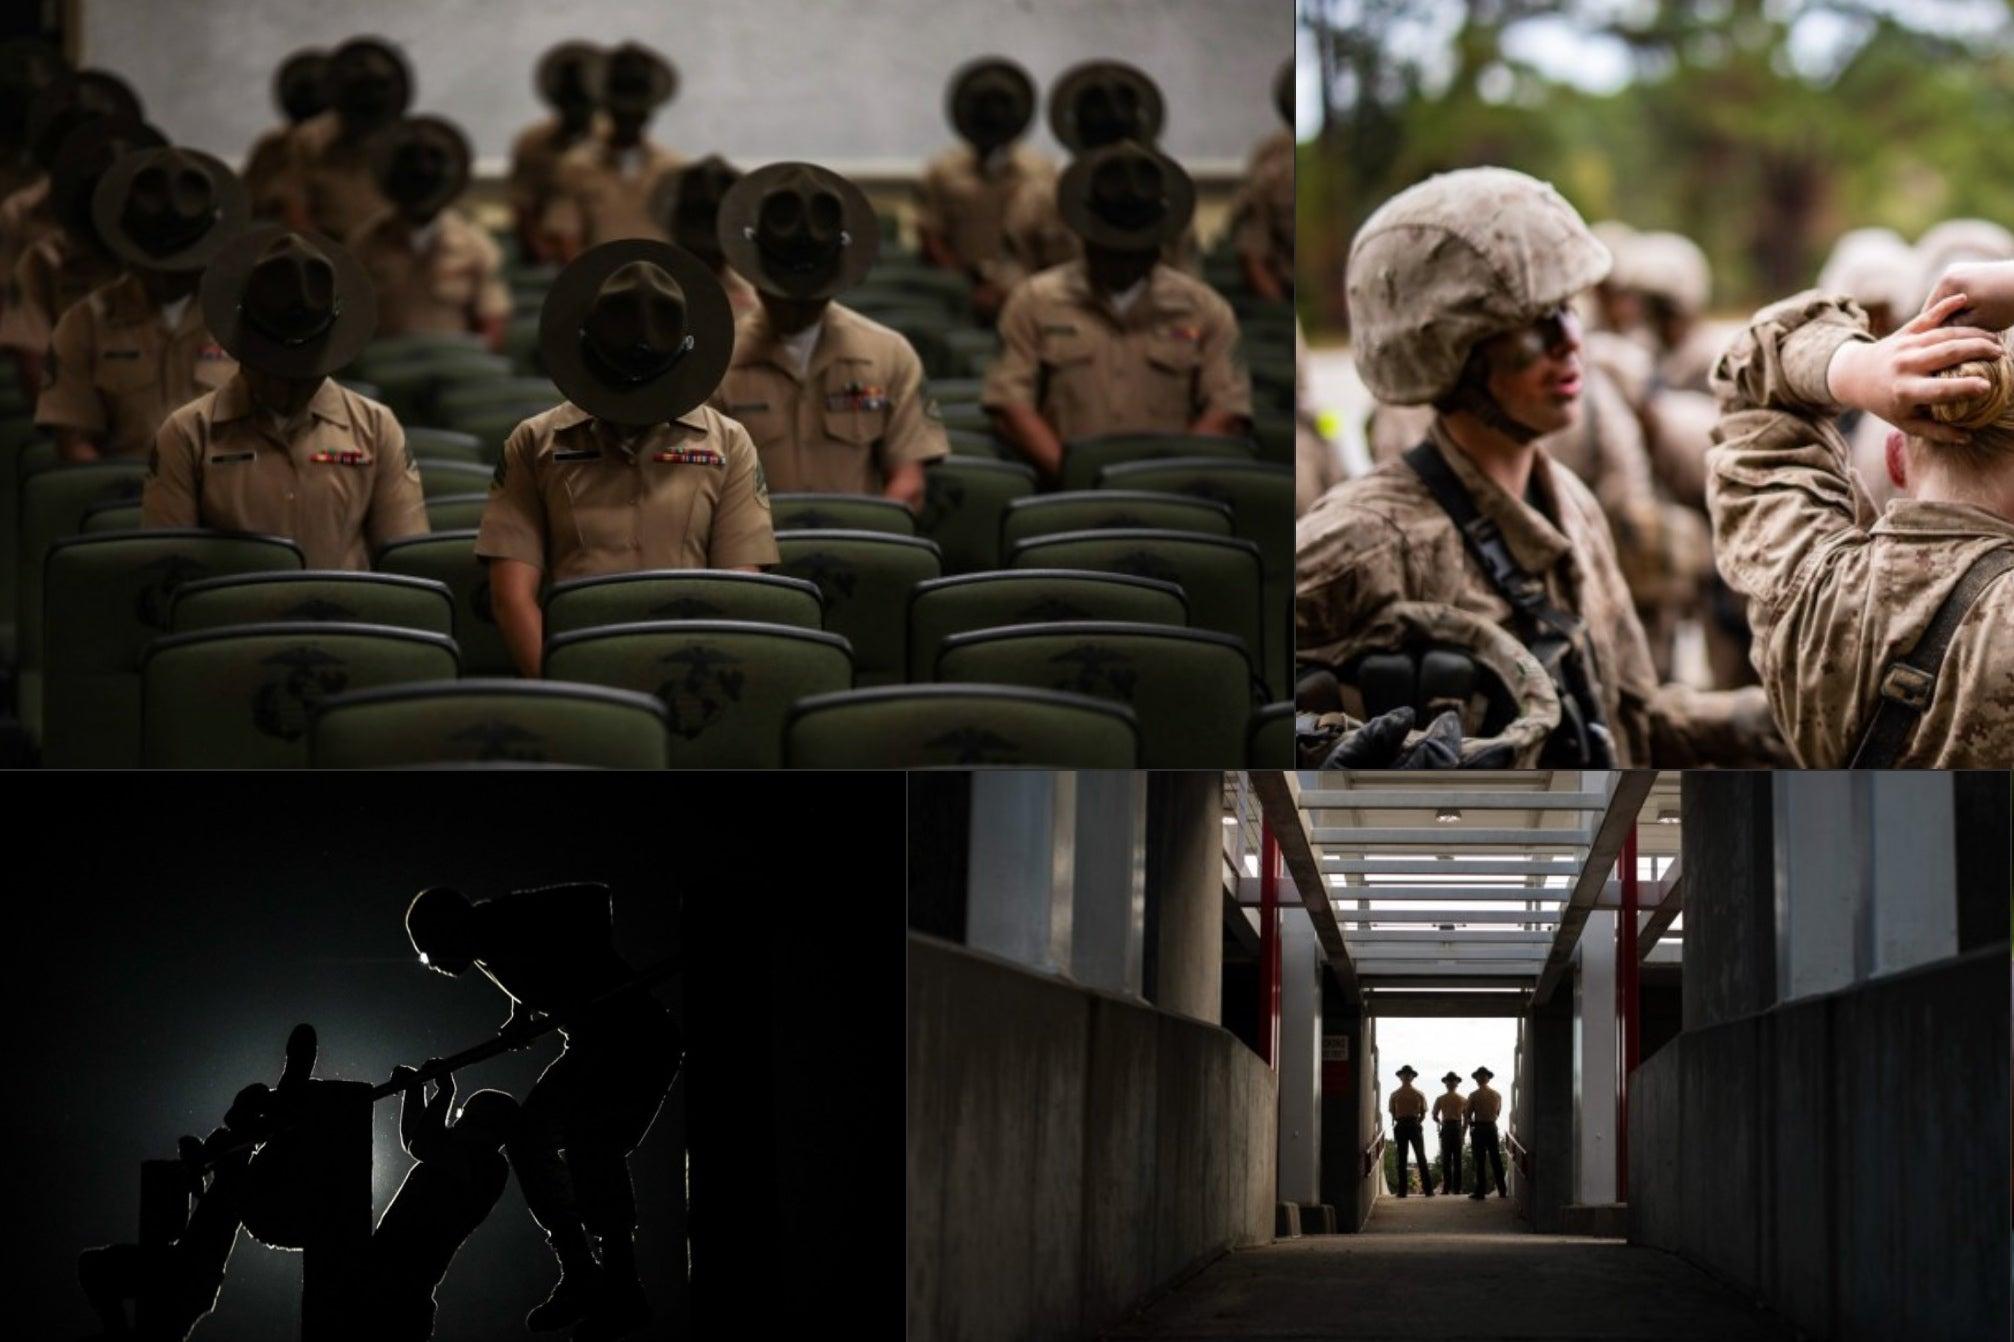 dana beesley military photographer